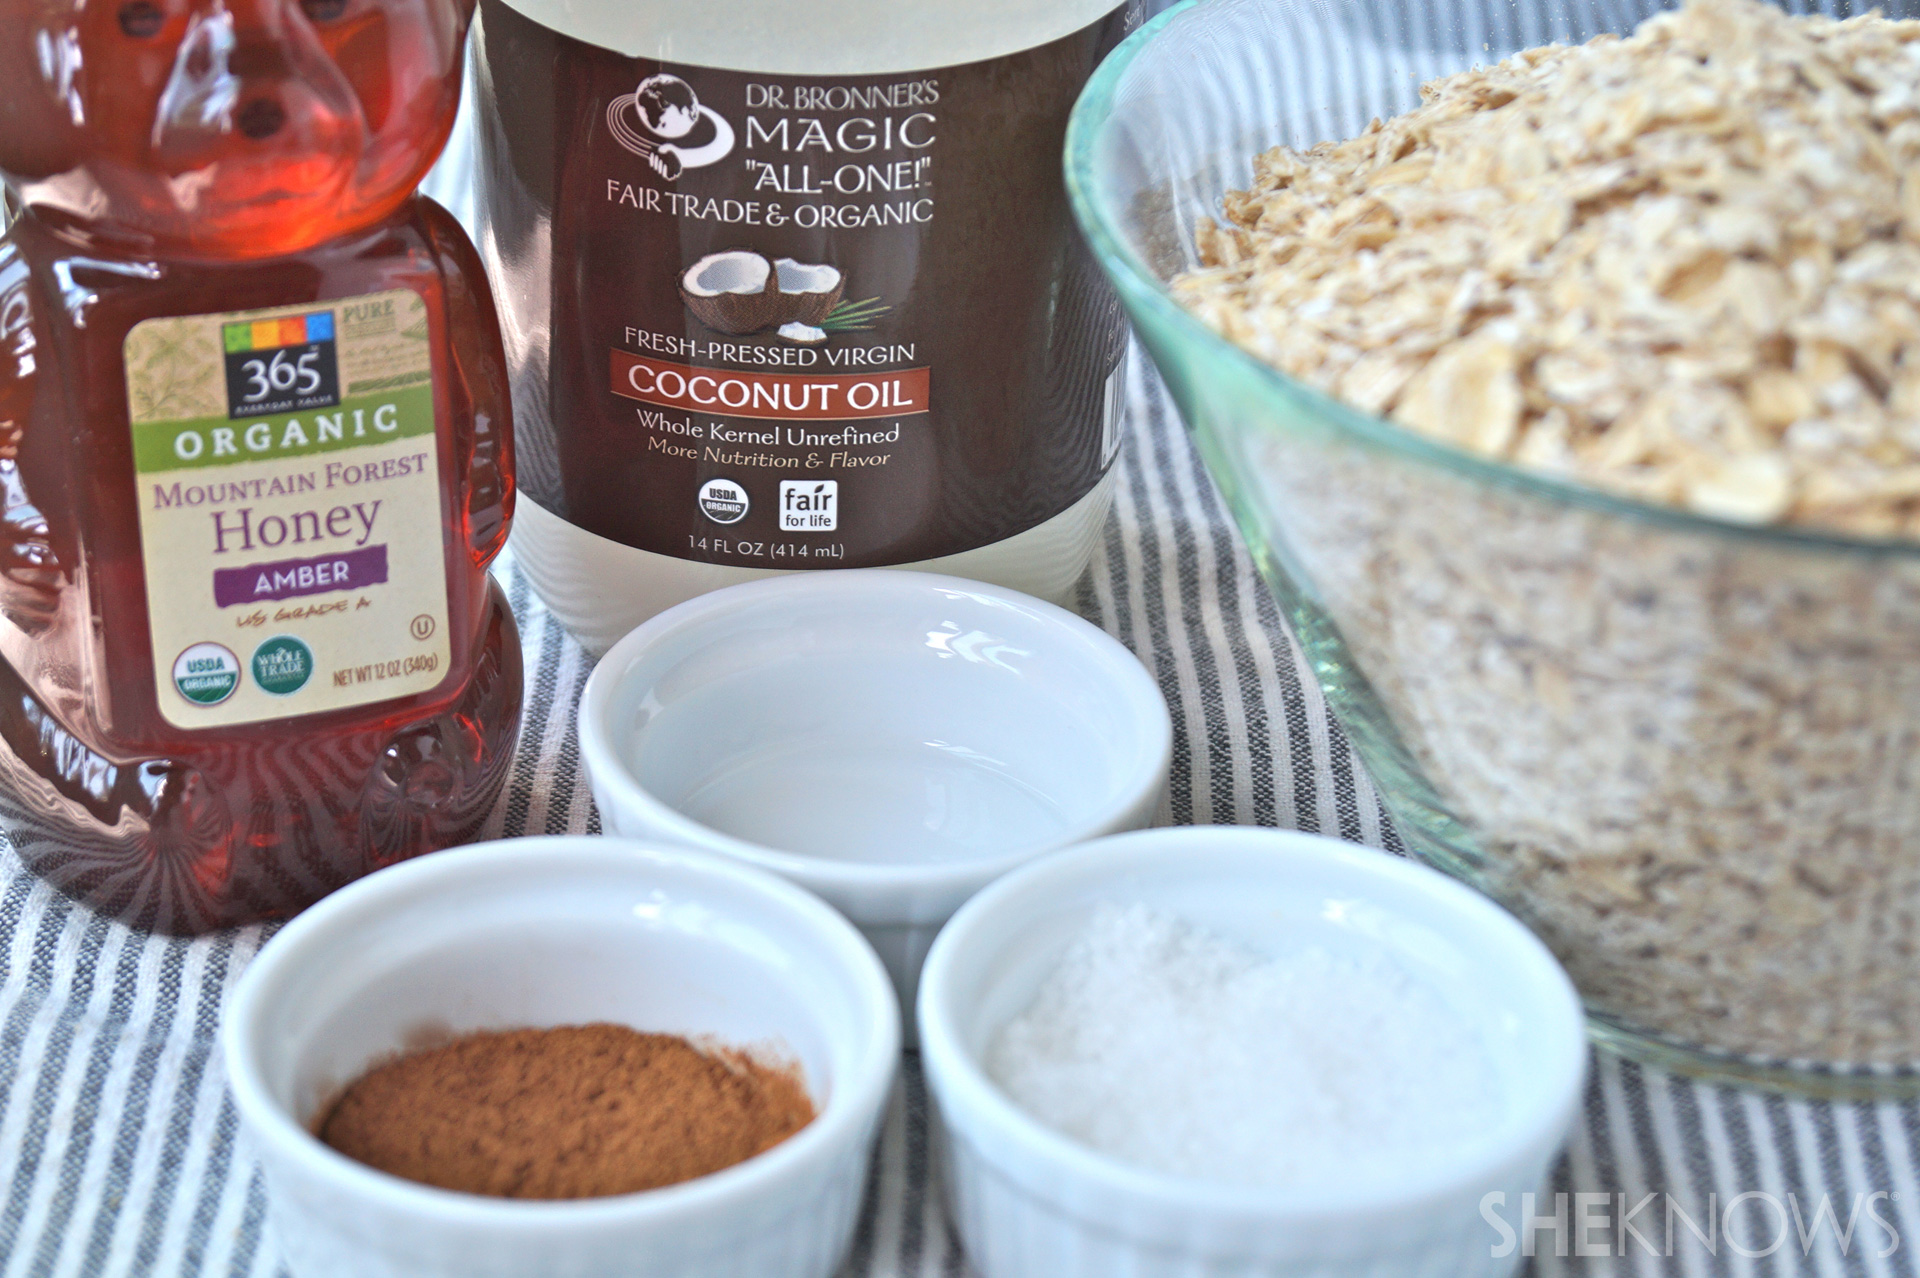 Spiced Cinnamon Granola ingredients